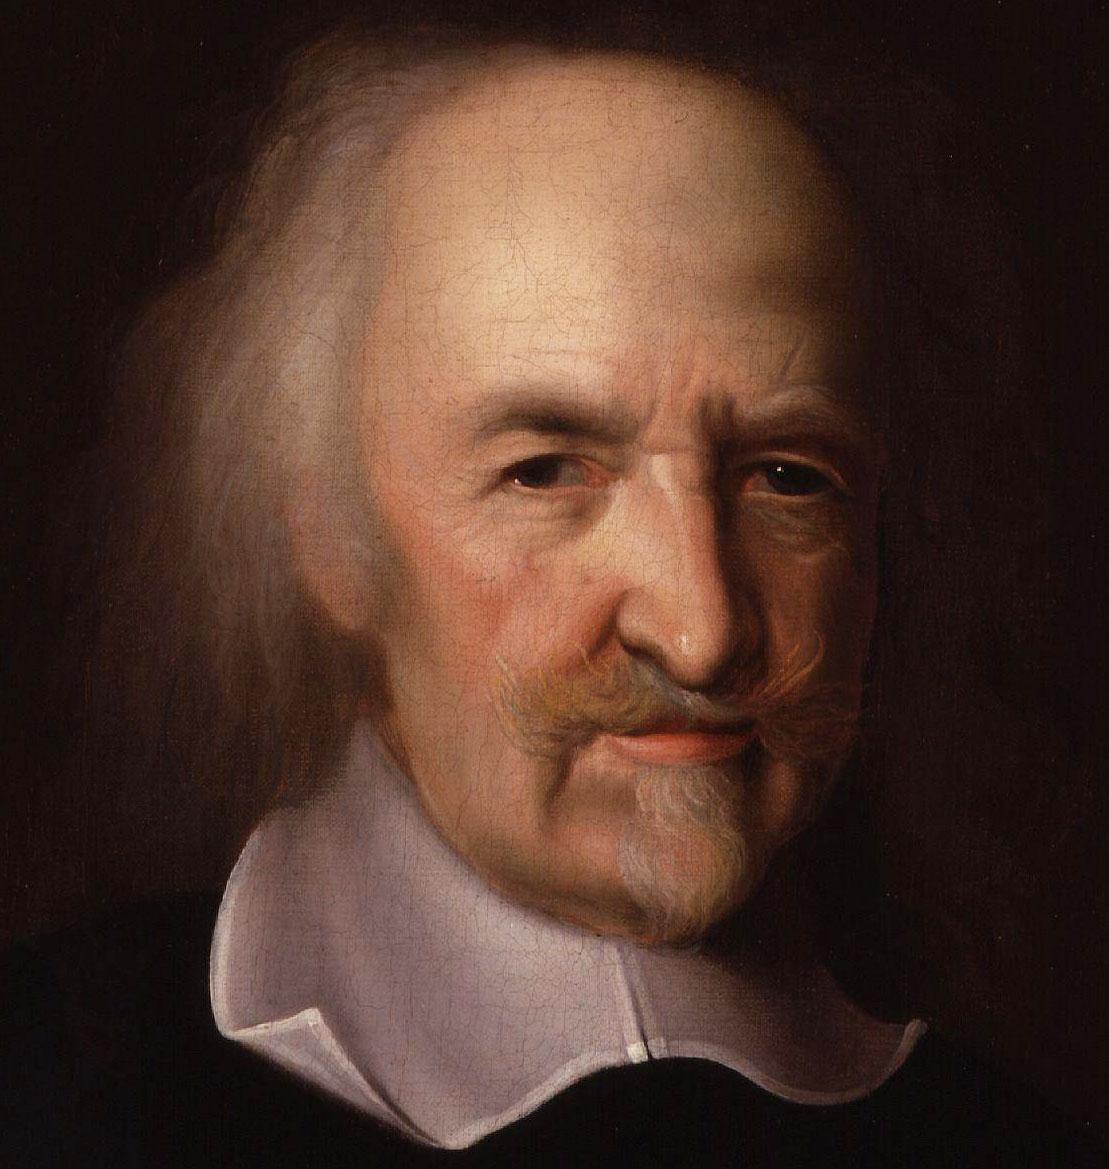 Thomas Hobbes (portrait, 17th century)